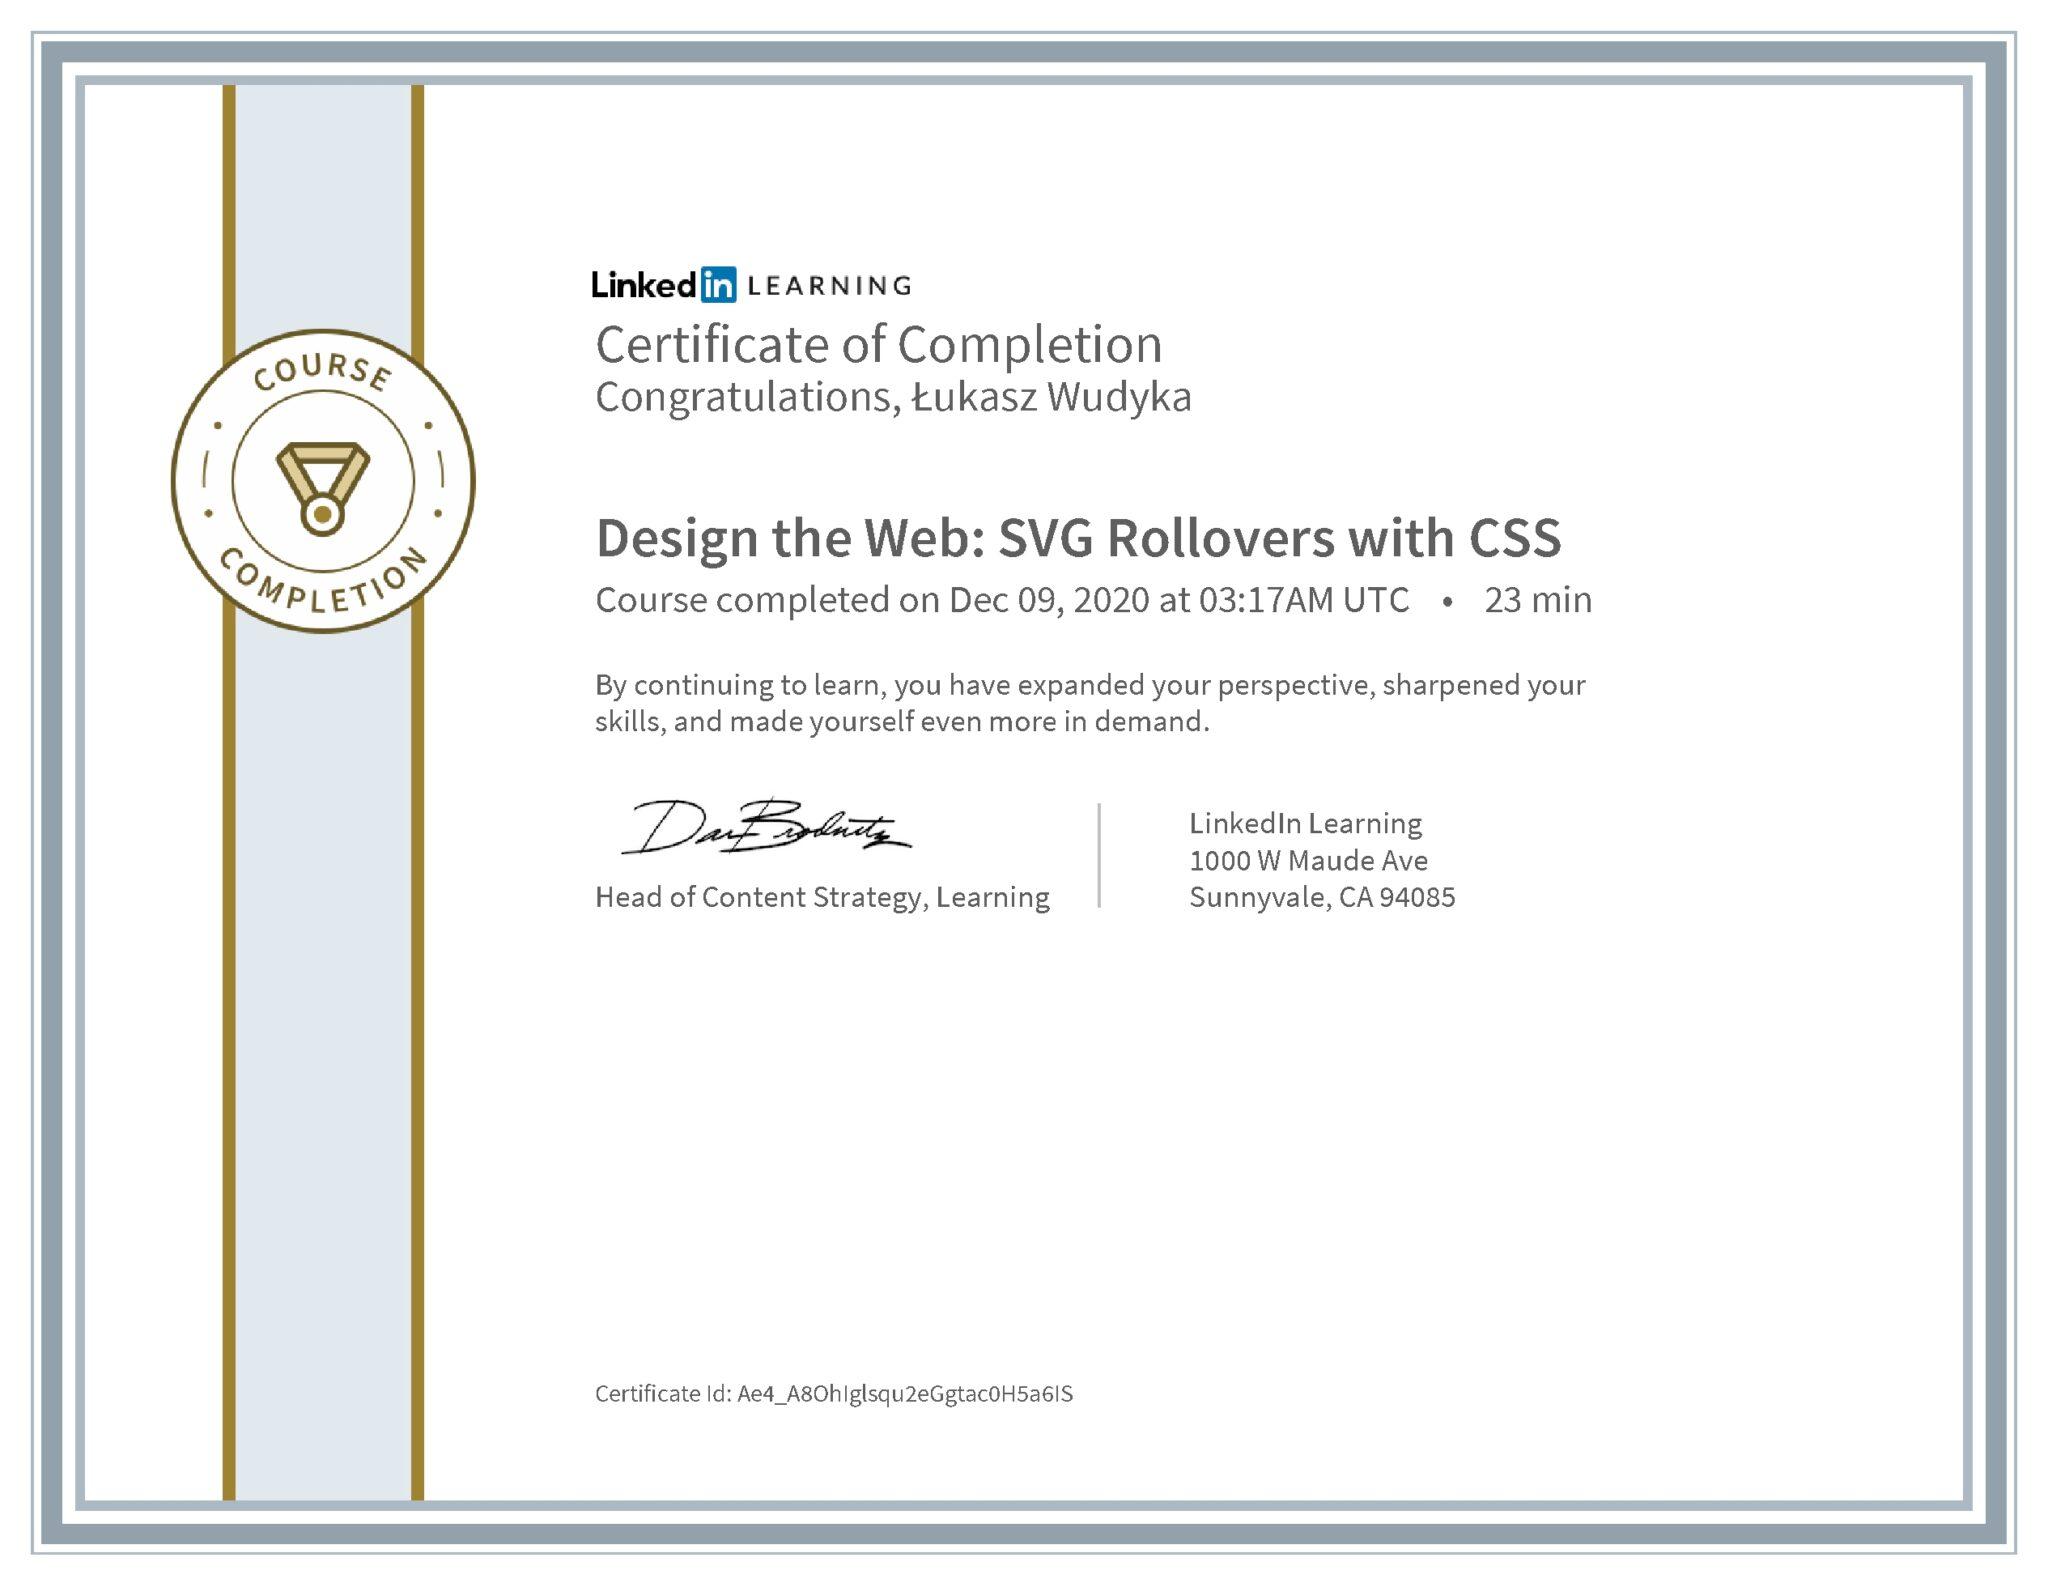 Łukasz Wudyka certyfikat LinkedIn Design the Web: SVG Rollovers with CSS